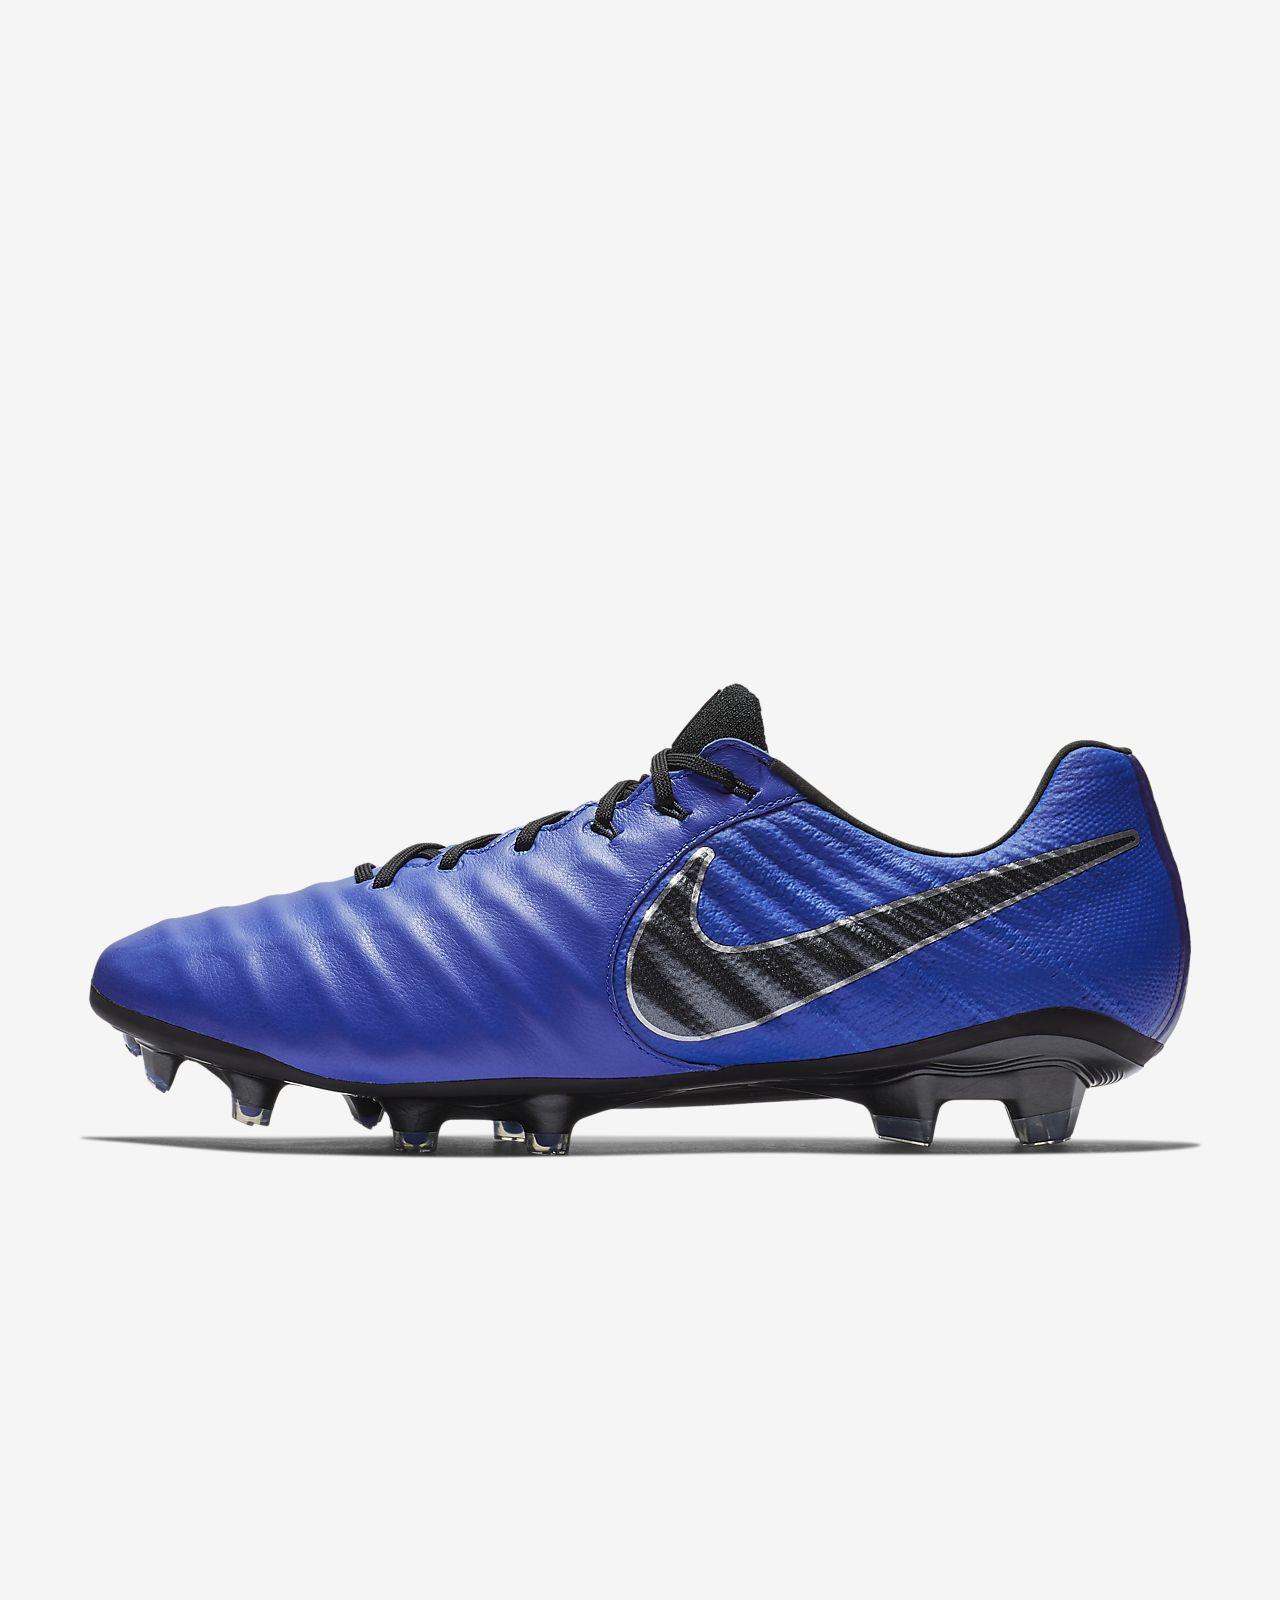 online store 1dfd5 54758 ... Fotbollssko för gräs Nike Legend 7 Elite FG